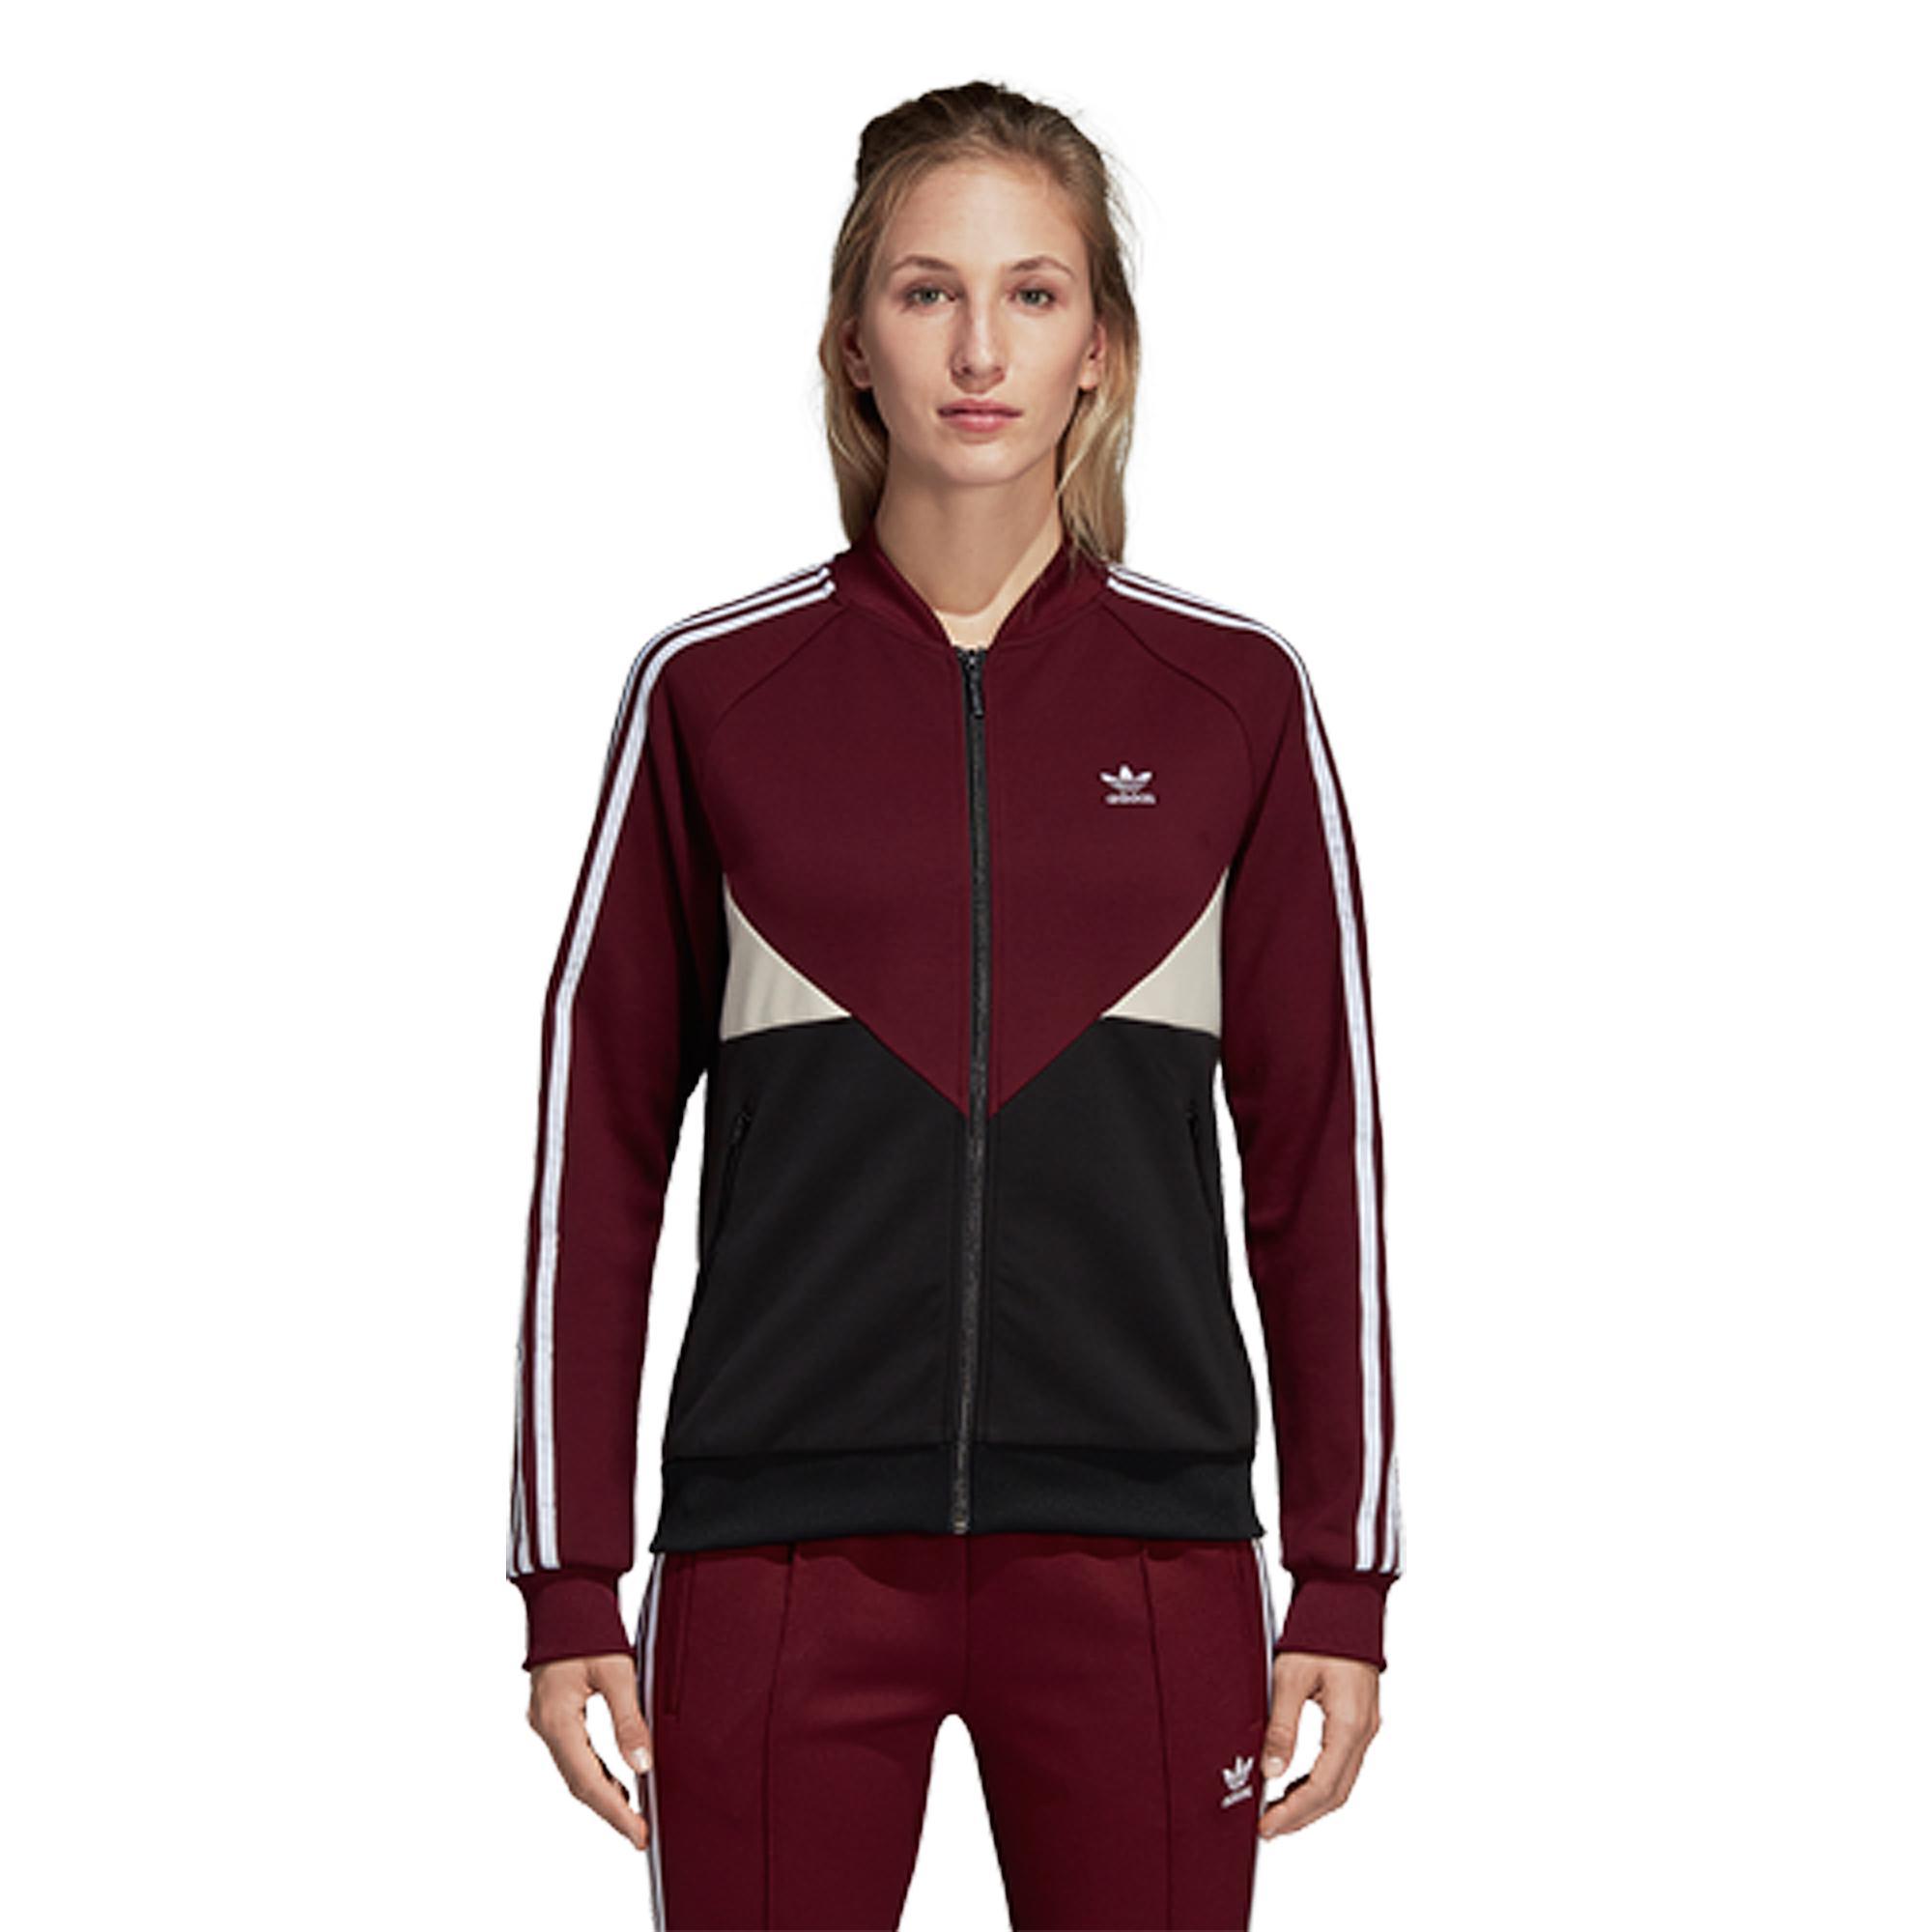 Lyst - adidas Originals Colorado Track Jacket in Red 3359b8e9d